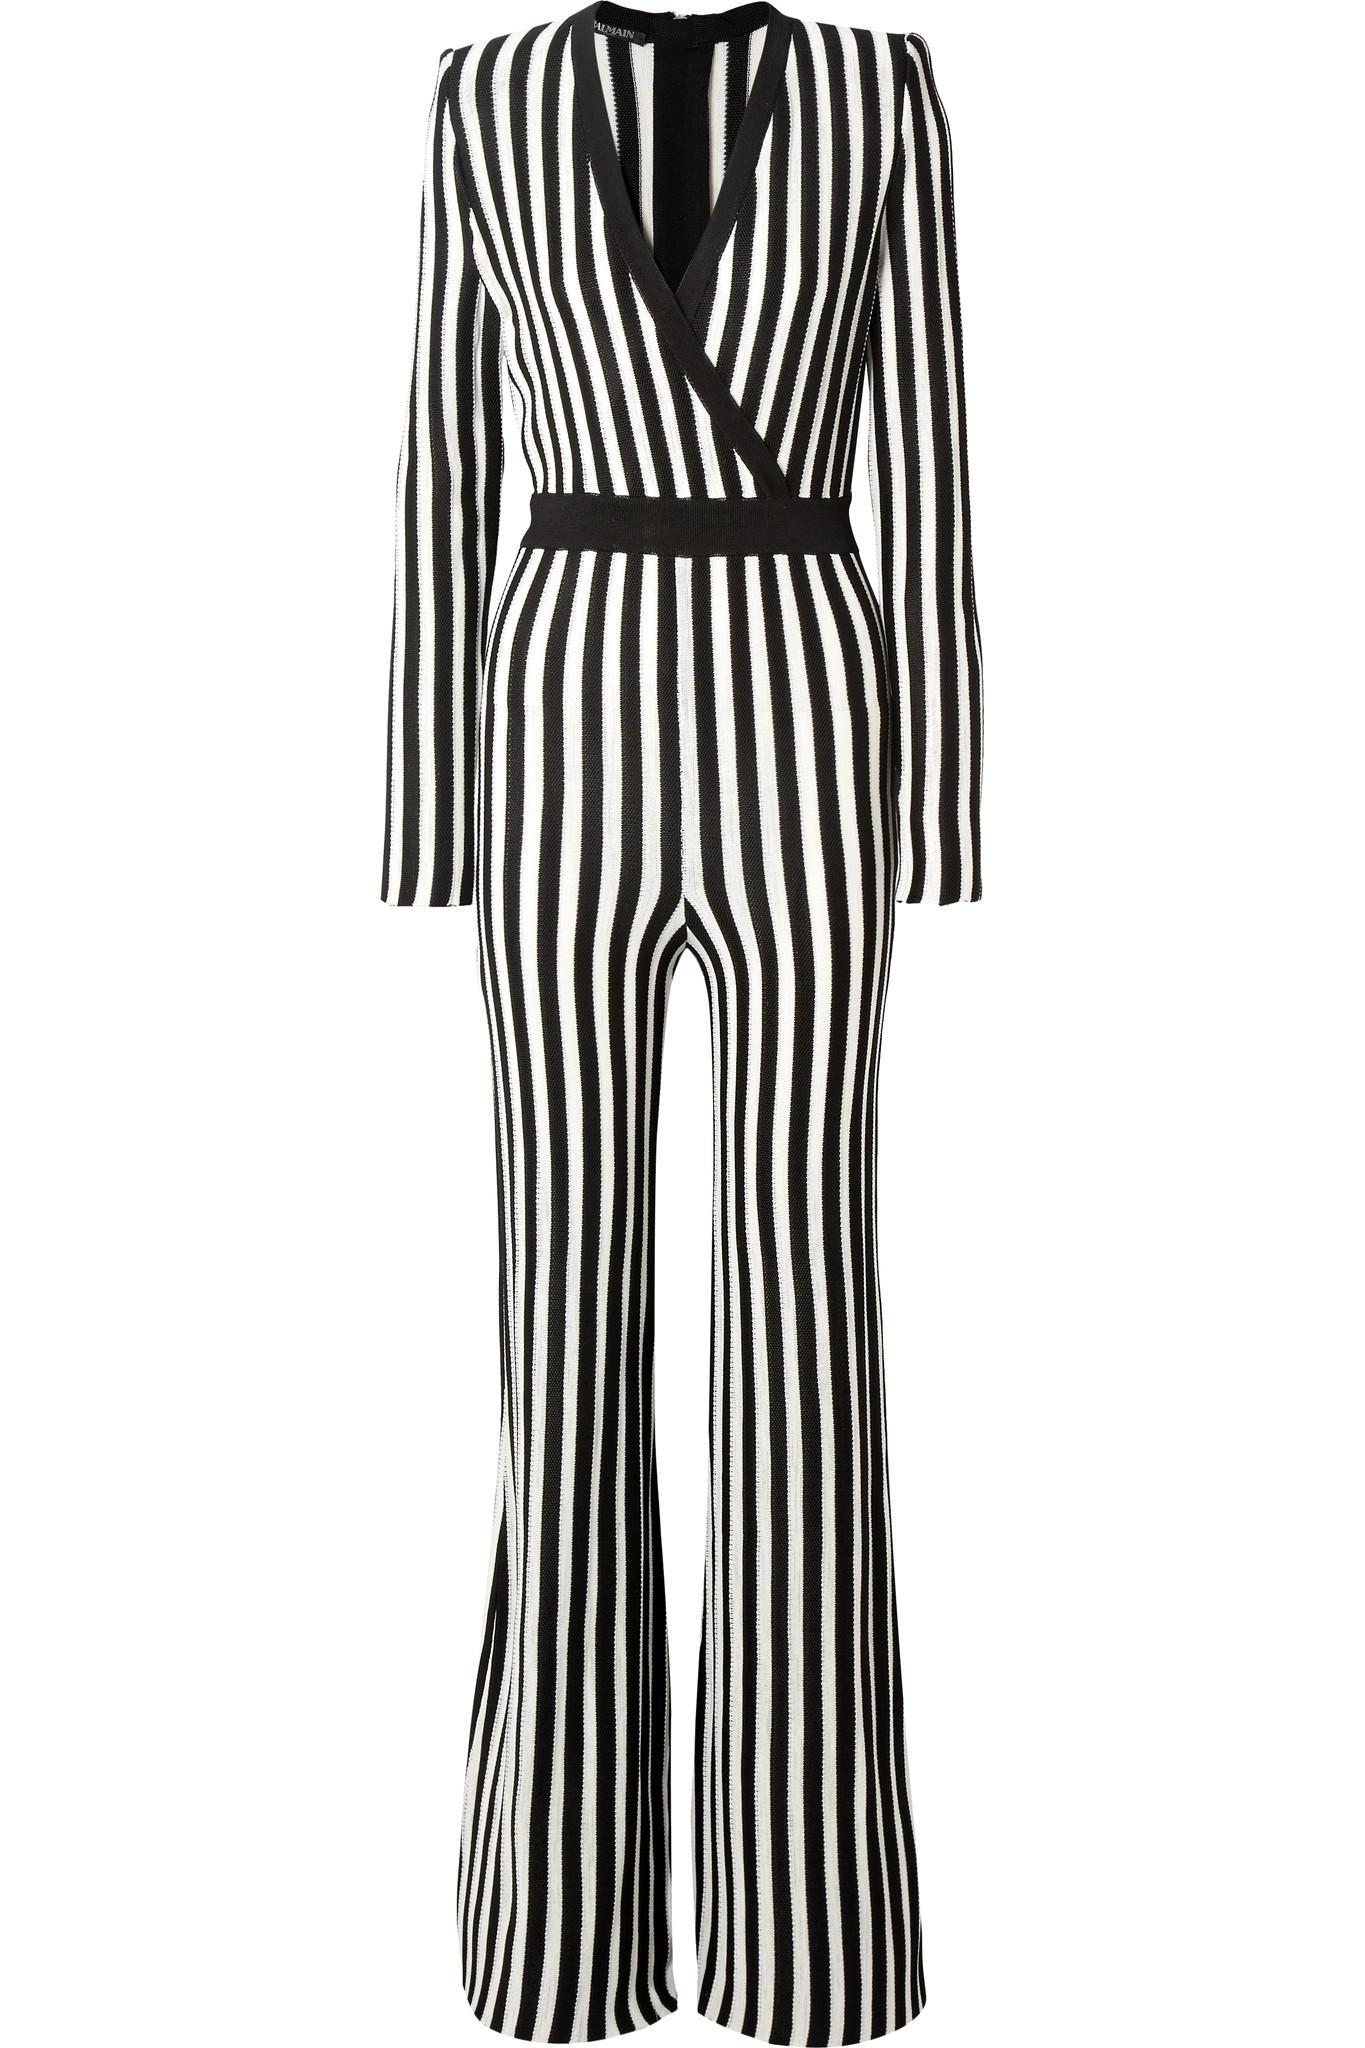 51deb350345 Lyst - Balmain Wrap-effect Striped Stretch-knit Jumpsuit in Black